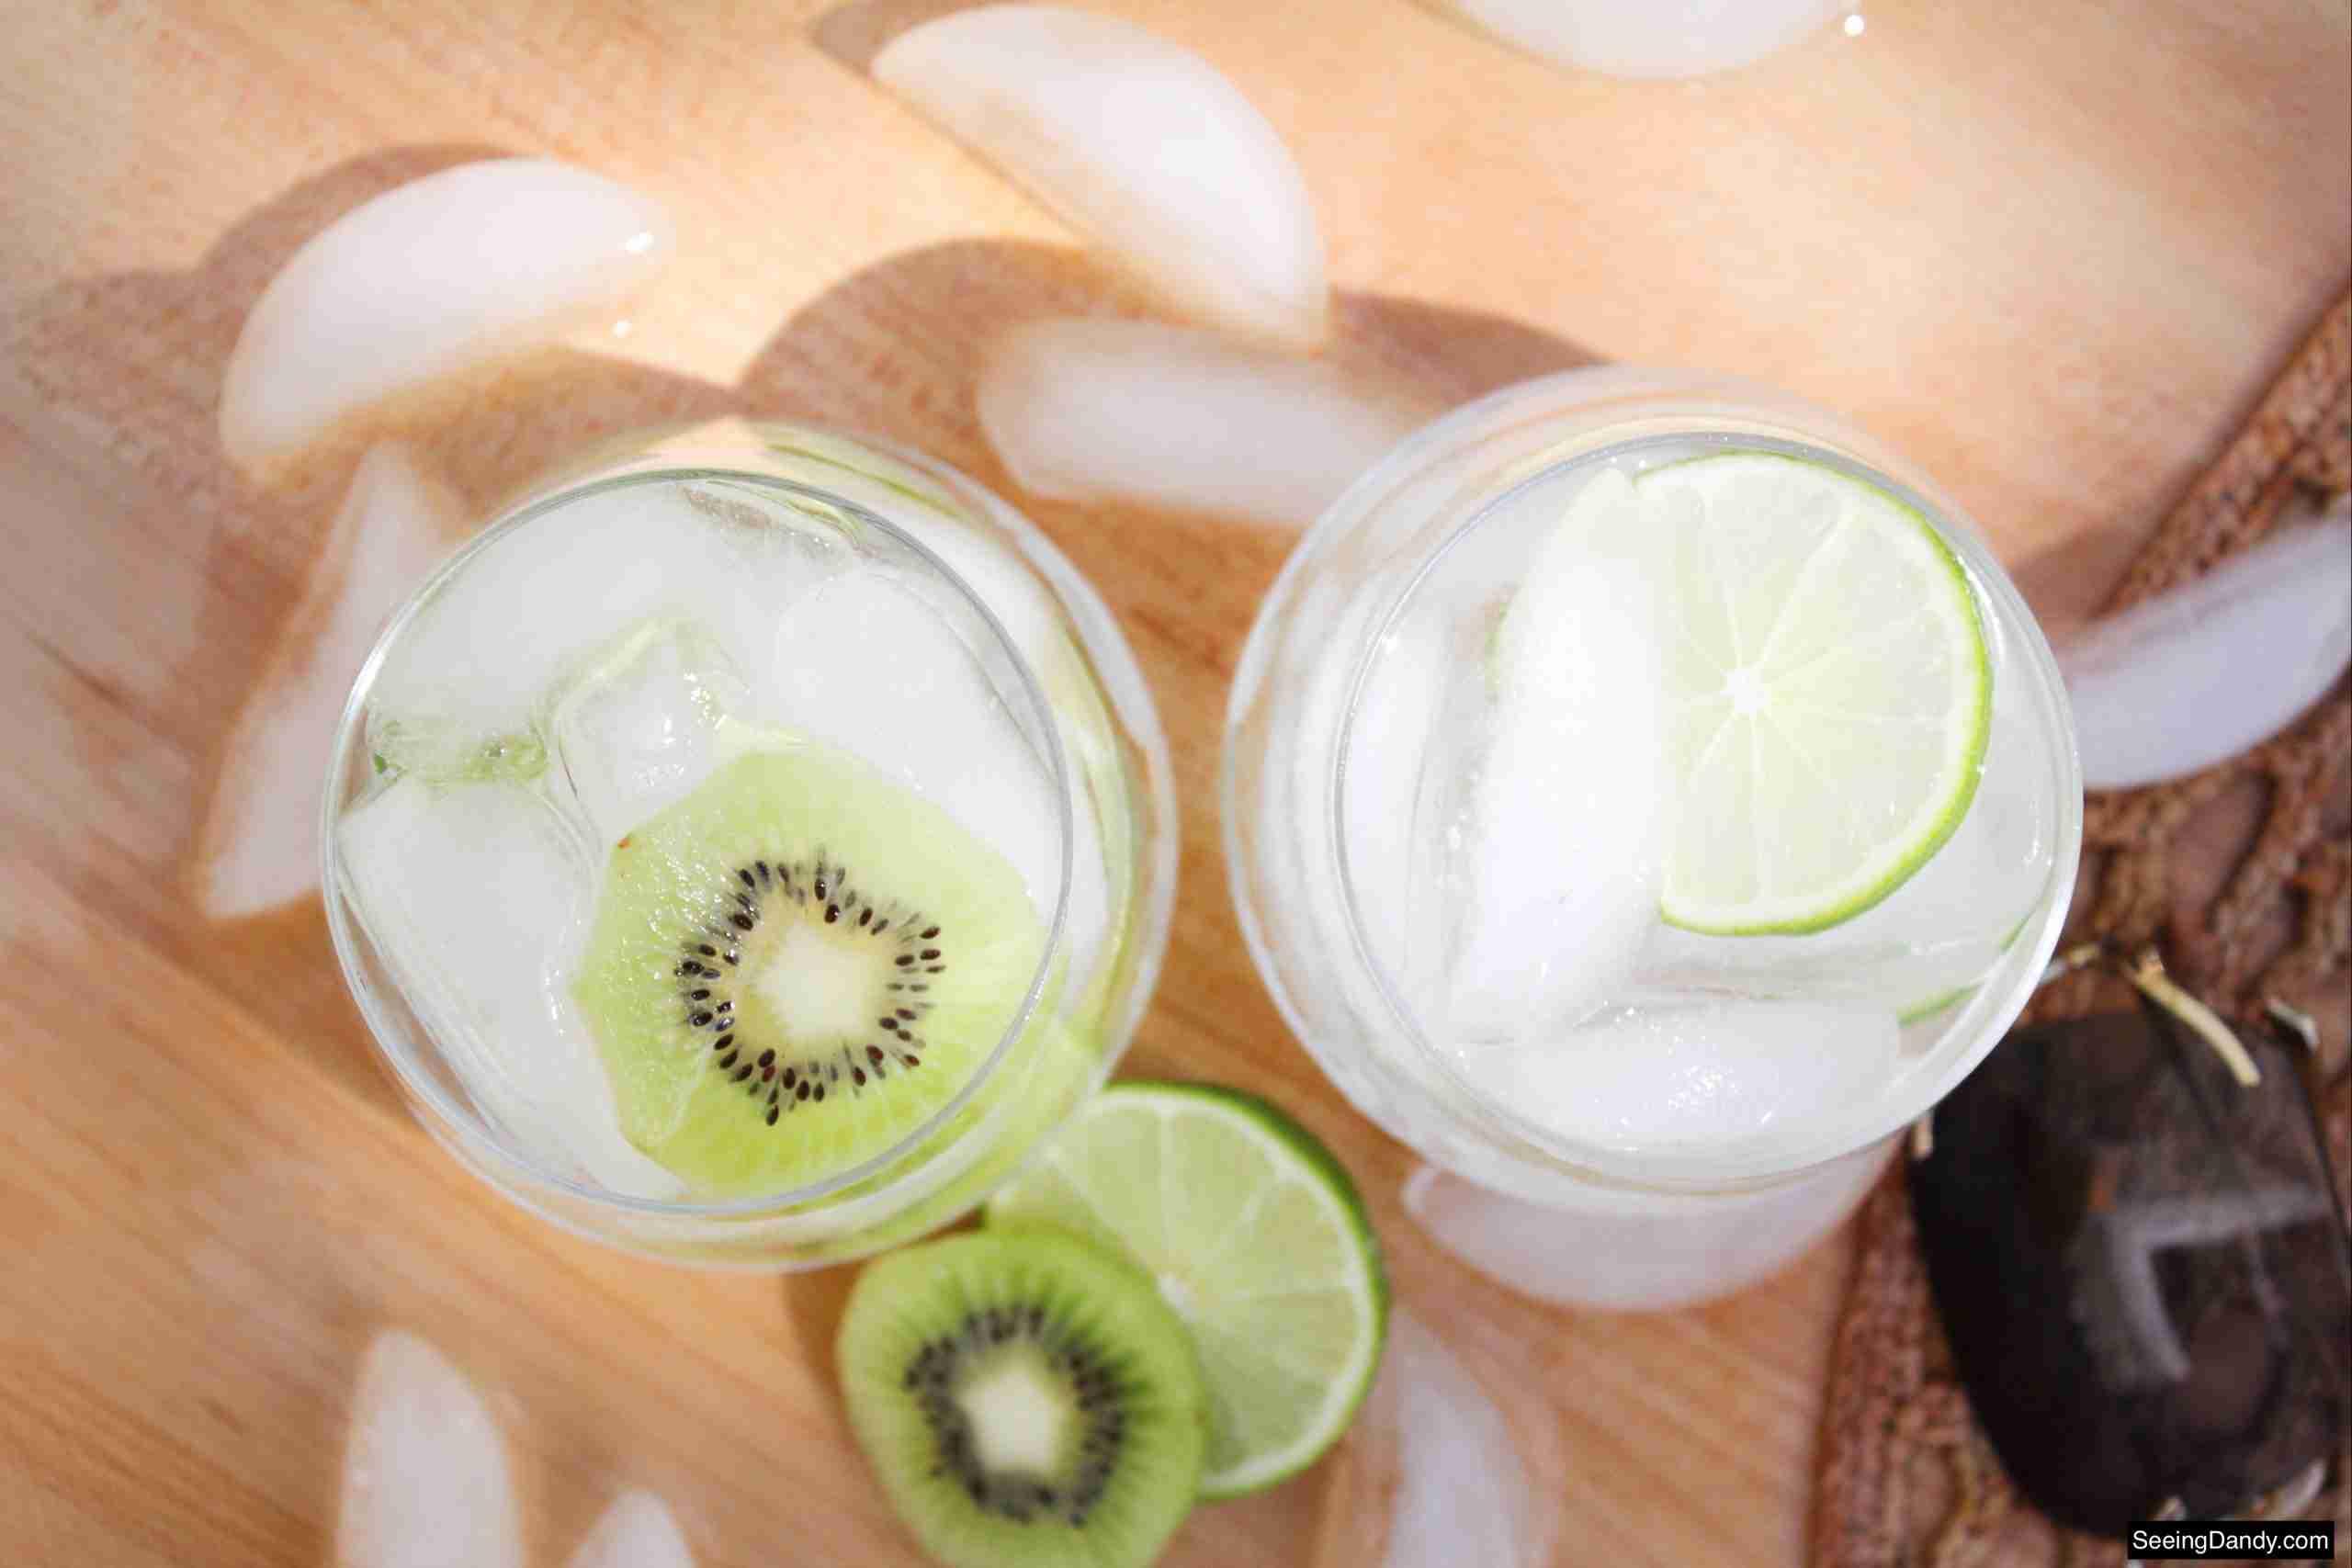 sliced fruit, summer recipes, poolside, patio drink, large sunglasses, melting ice